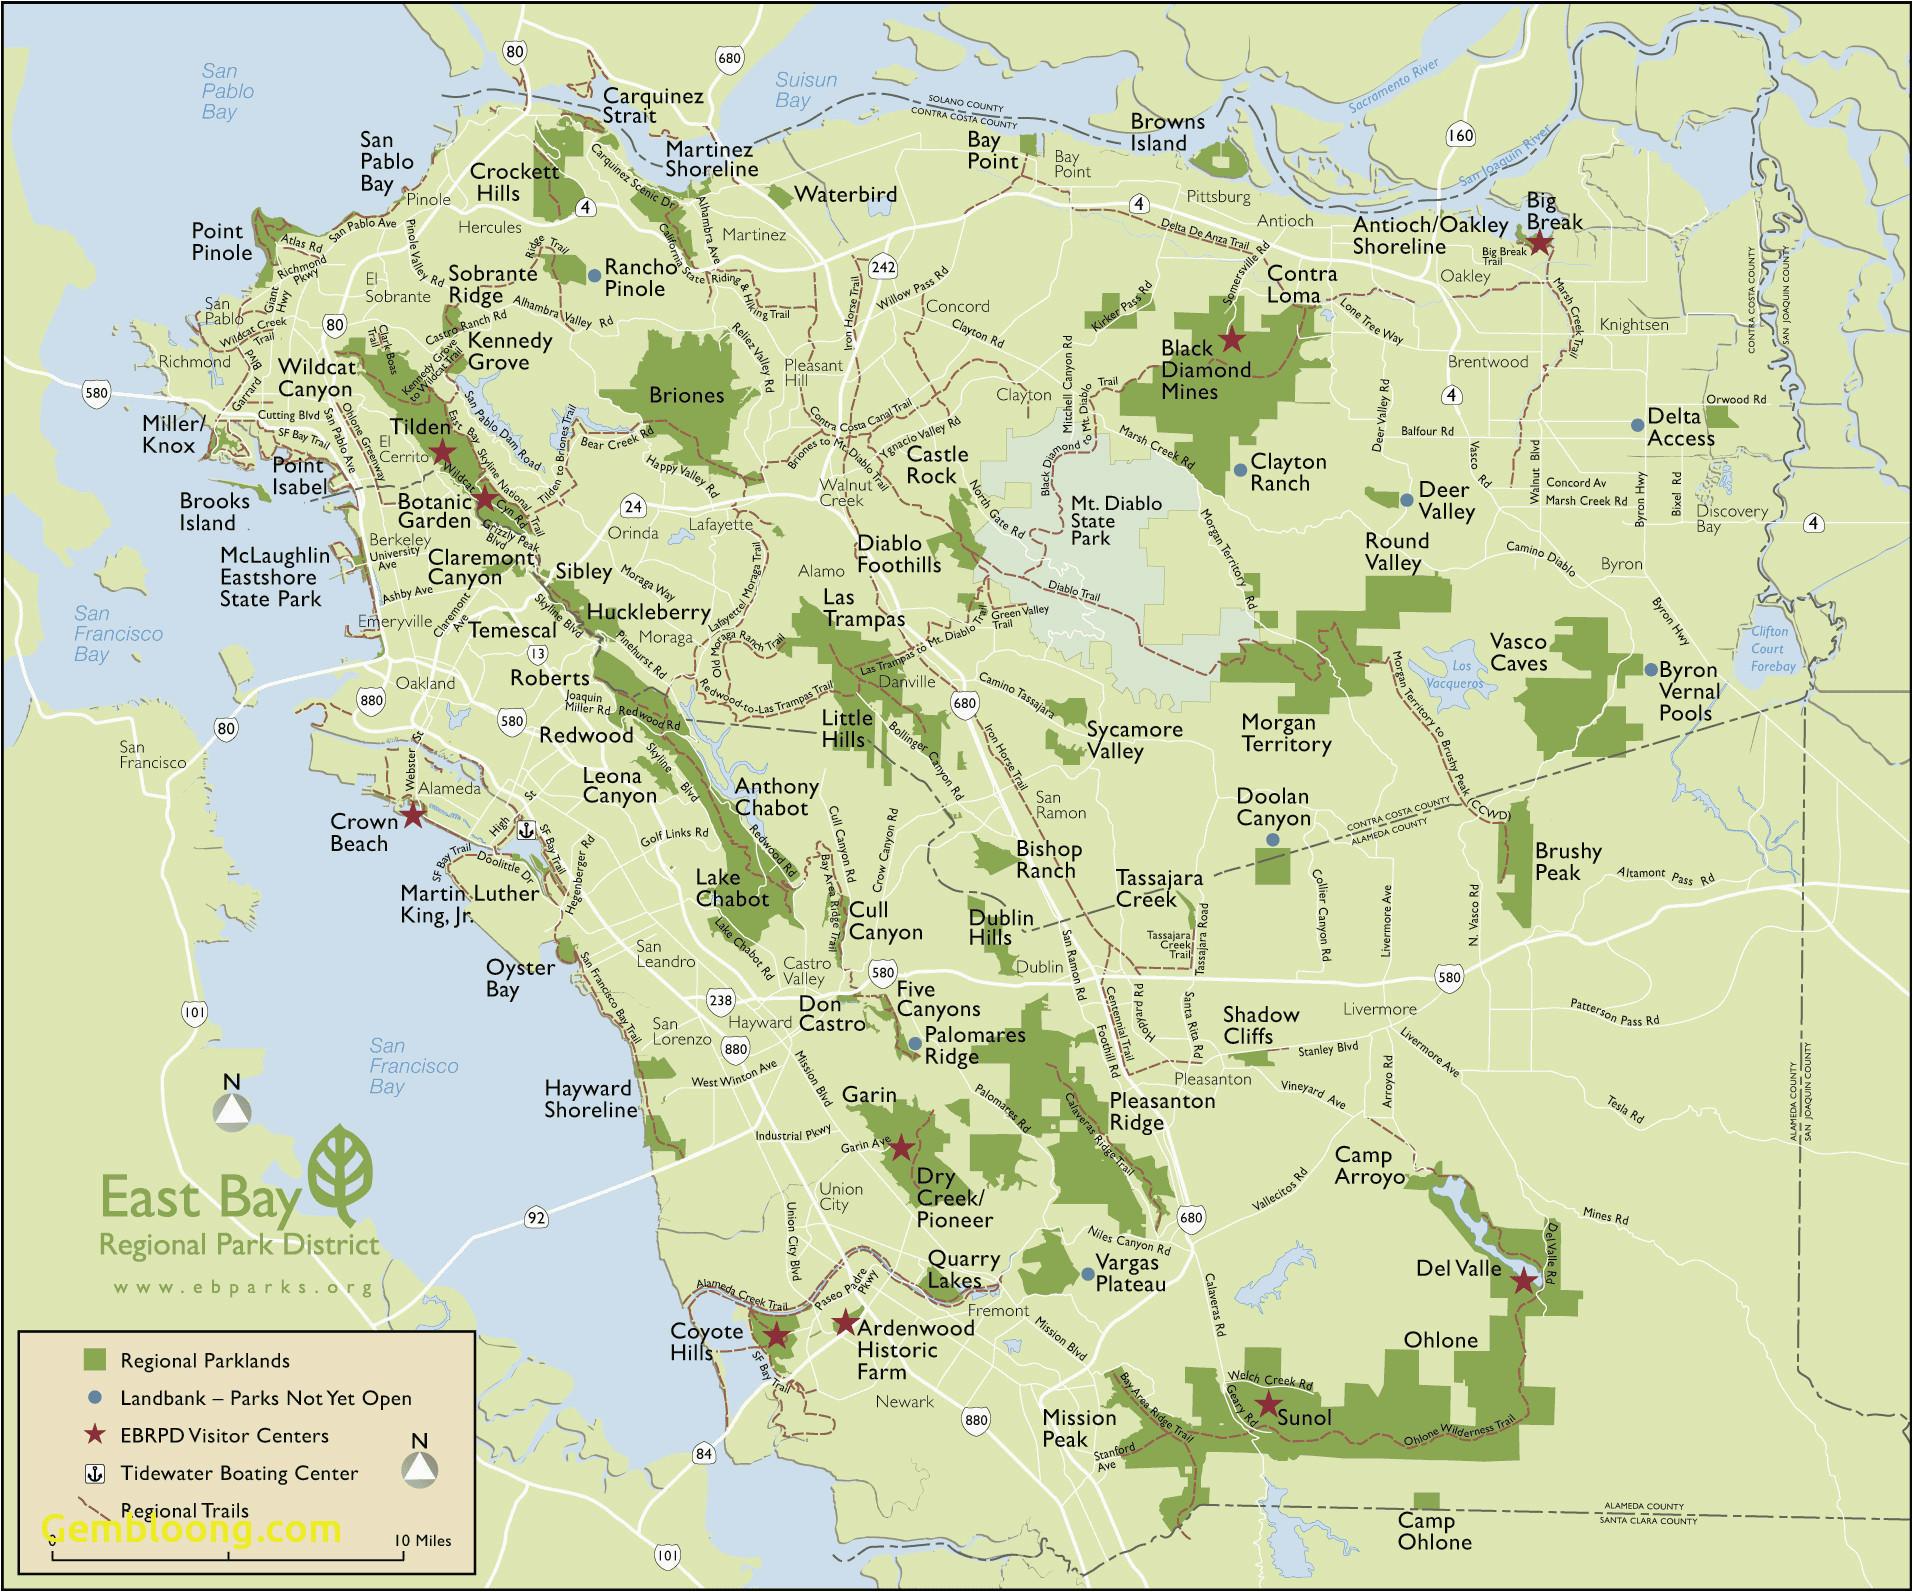 palm desert map lovely map san francisco bay area california outline